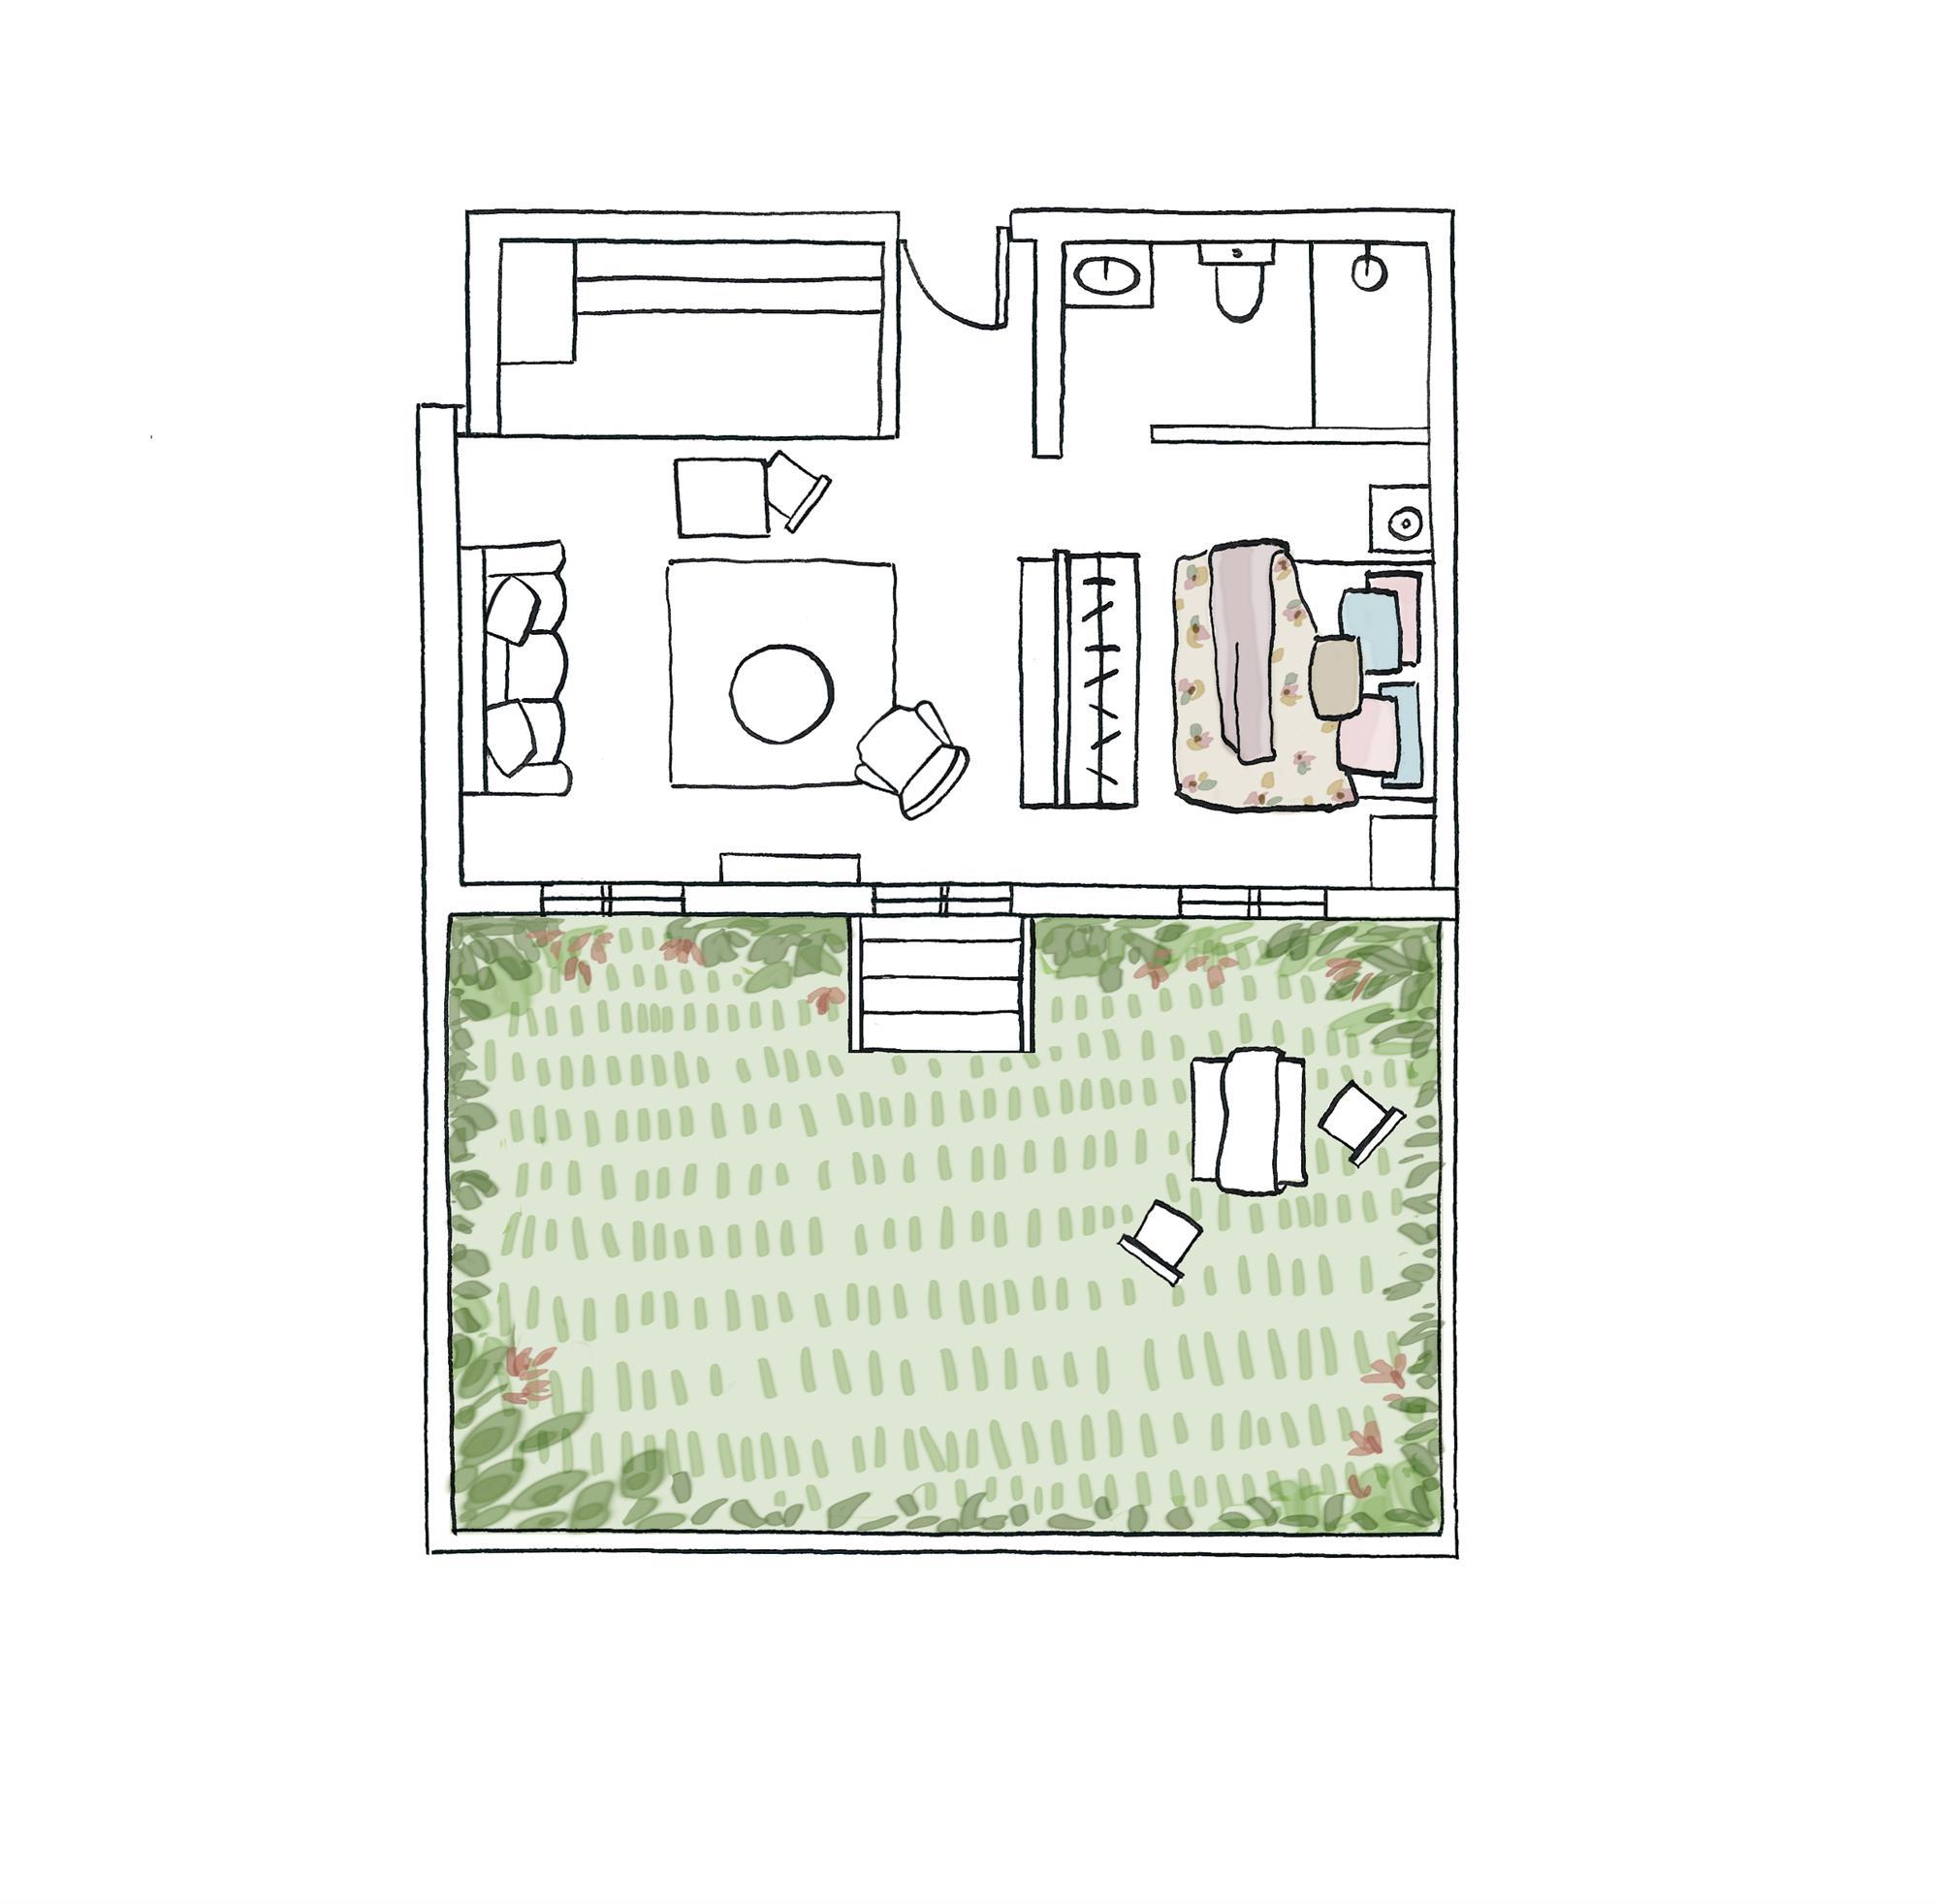 C Mo Hacer Un Plano A Escala Paso A Paso # Muebles Dibujo Arquitectonico